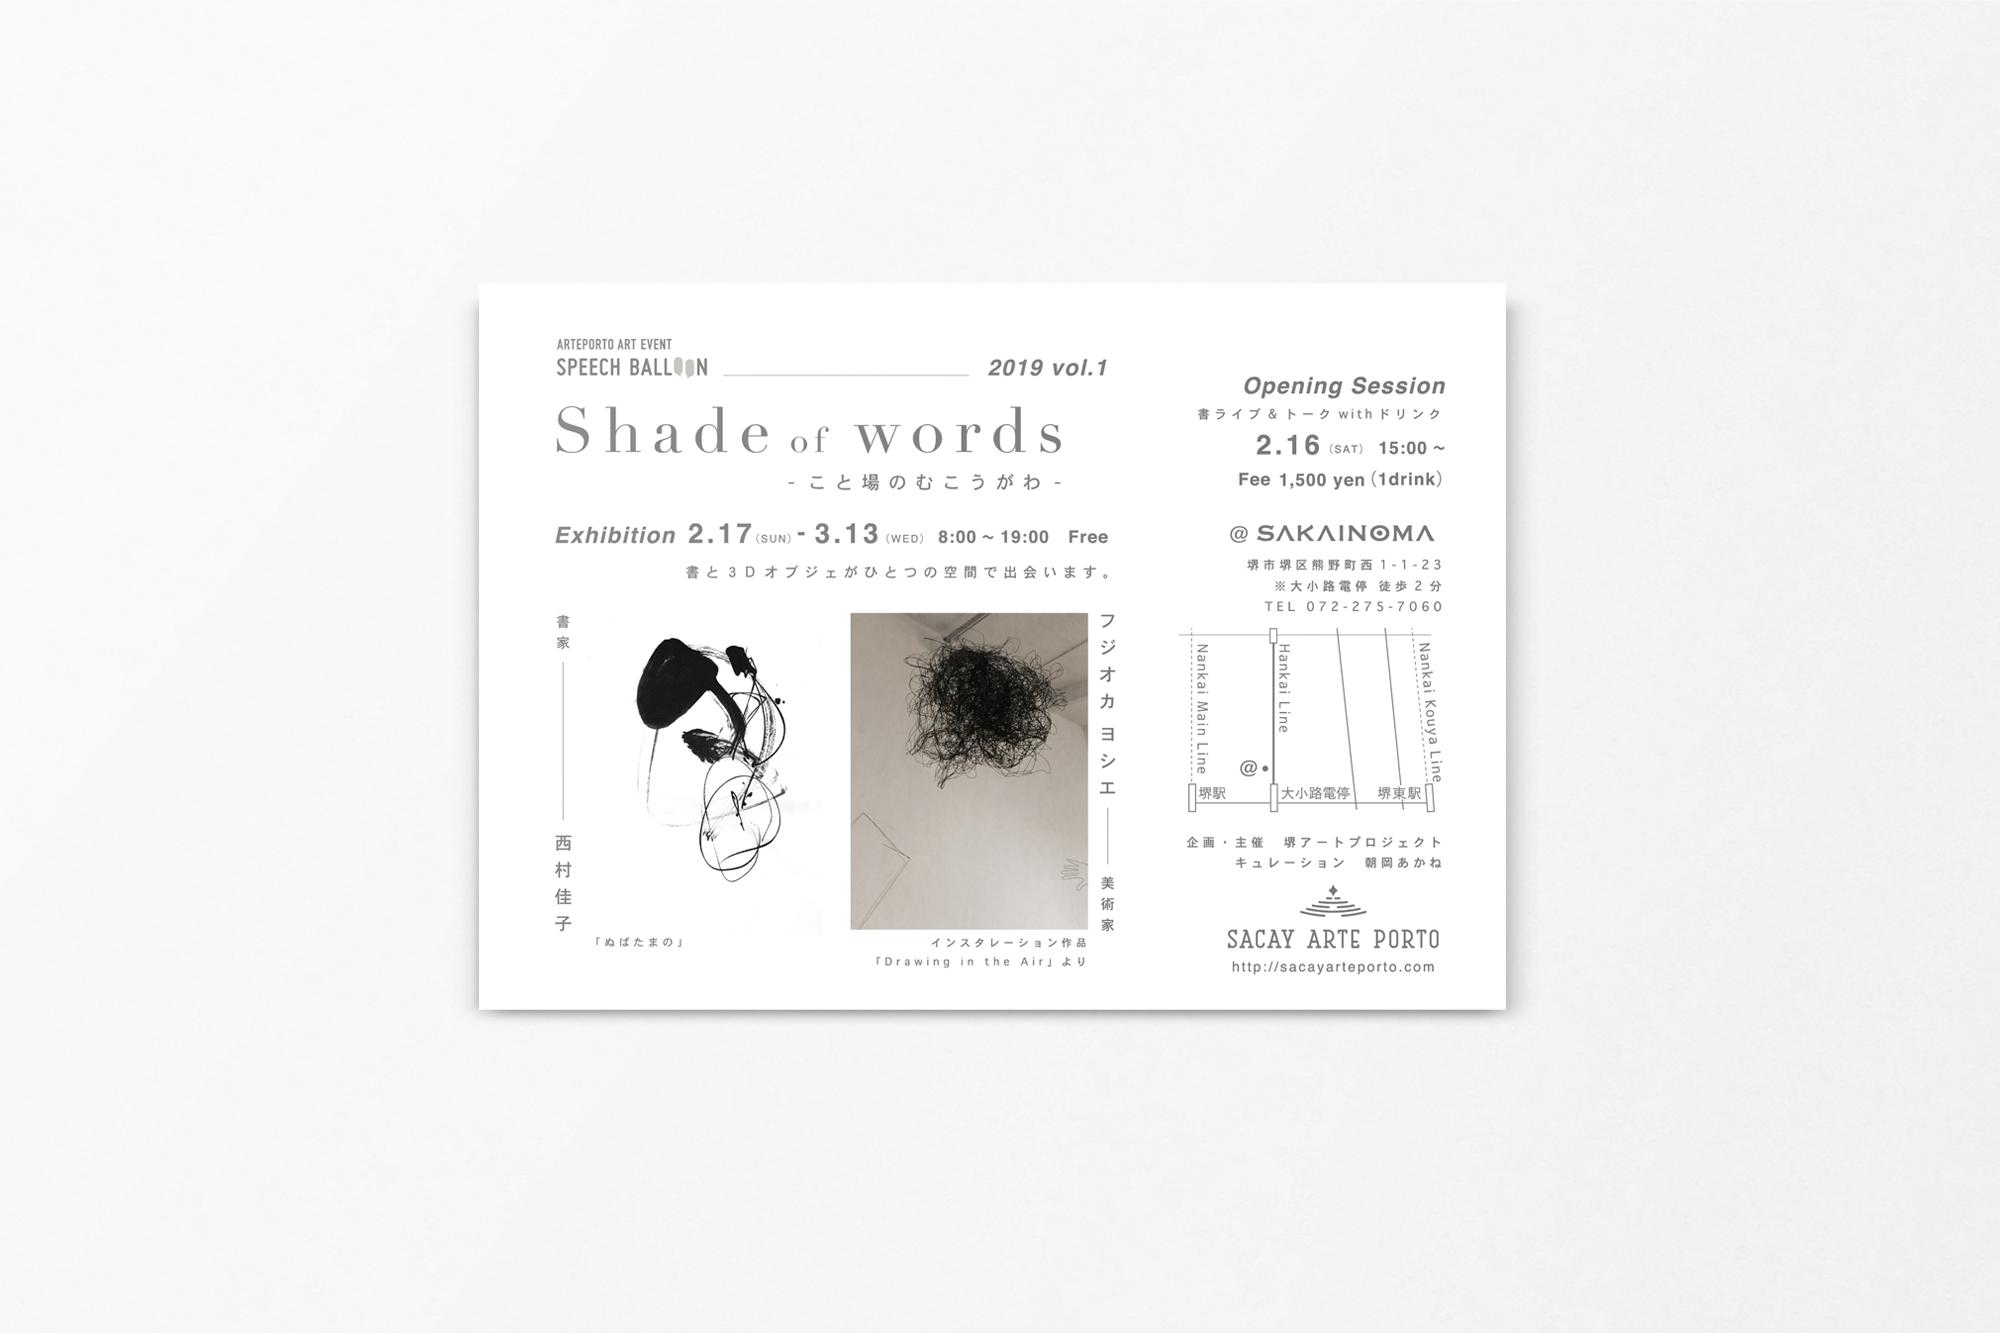 Speech Baloon 2019 vol.1 「Shade of words -こと場のむこうがわ-」